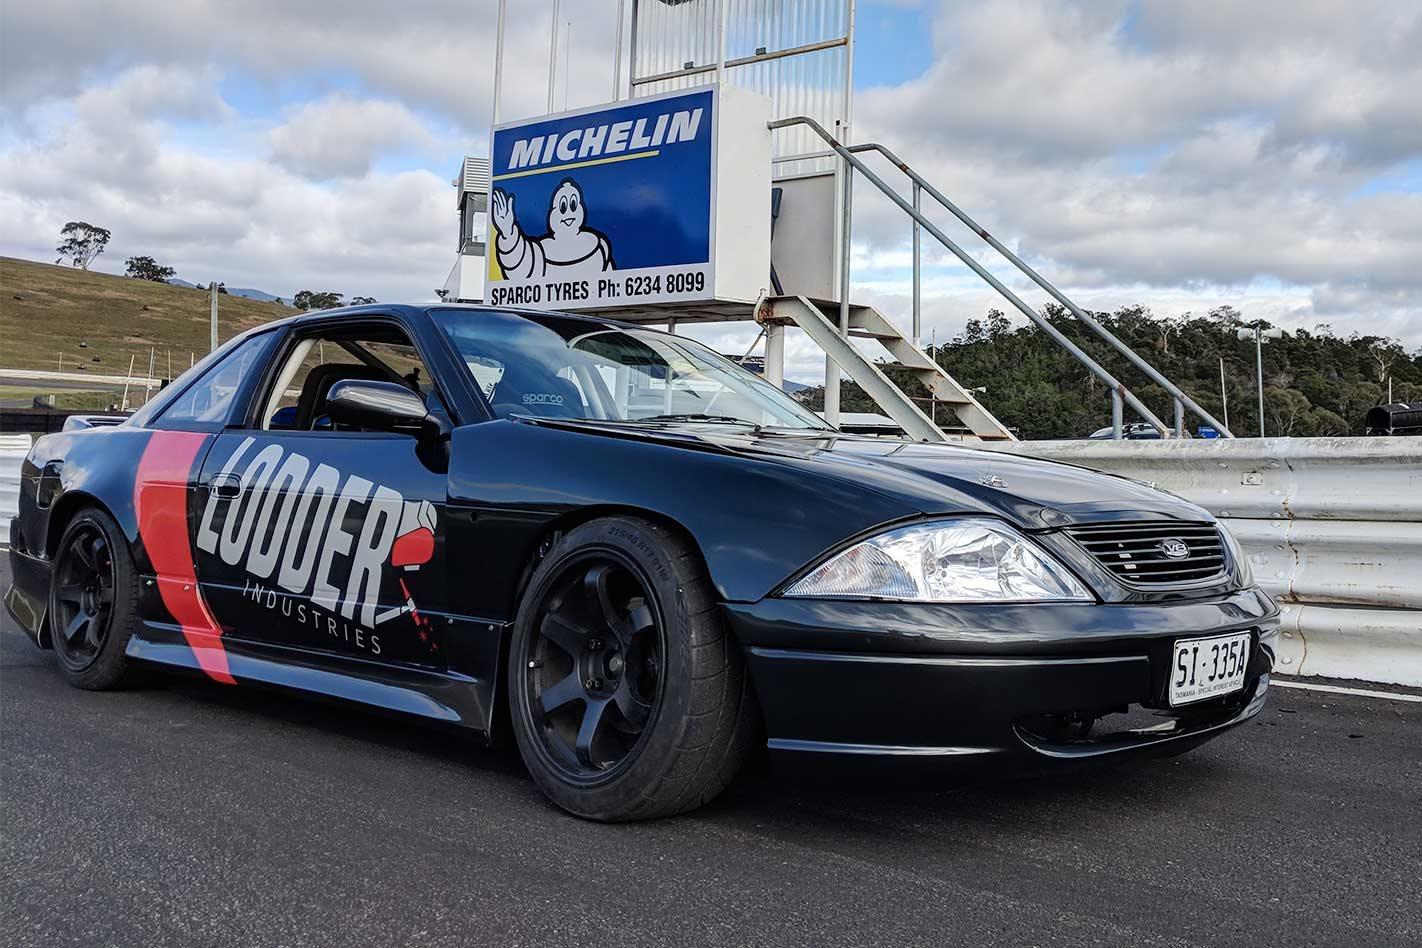 Nissan Silvia S13 Drift Car With Au Falcon Front Built In Tasmania